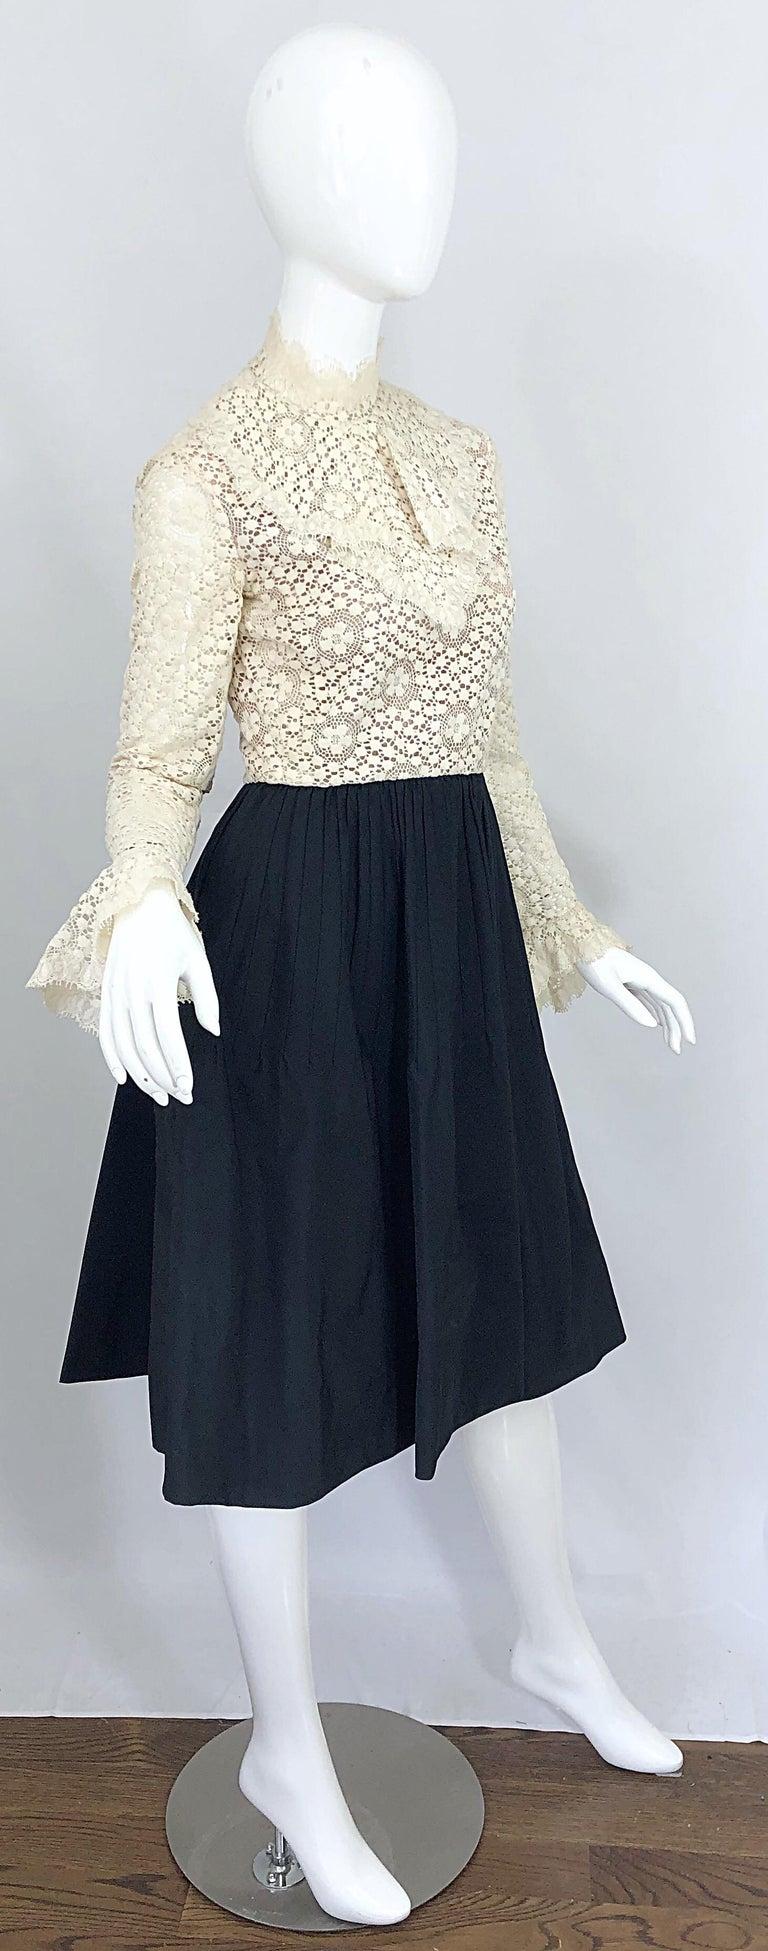 1960s Geoffrey Beene Ivory Crochet and Black Silk Taffeta Vintage 60s Dress For Sale 6